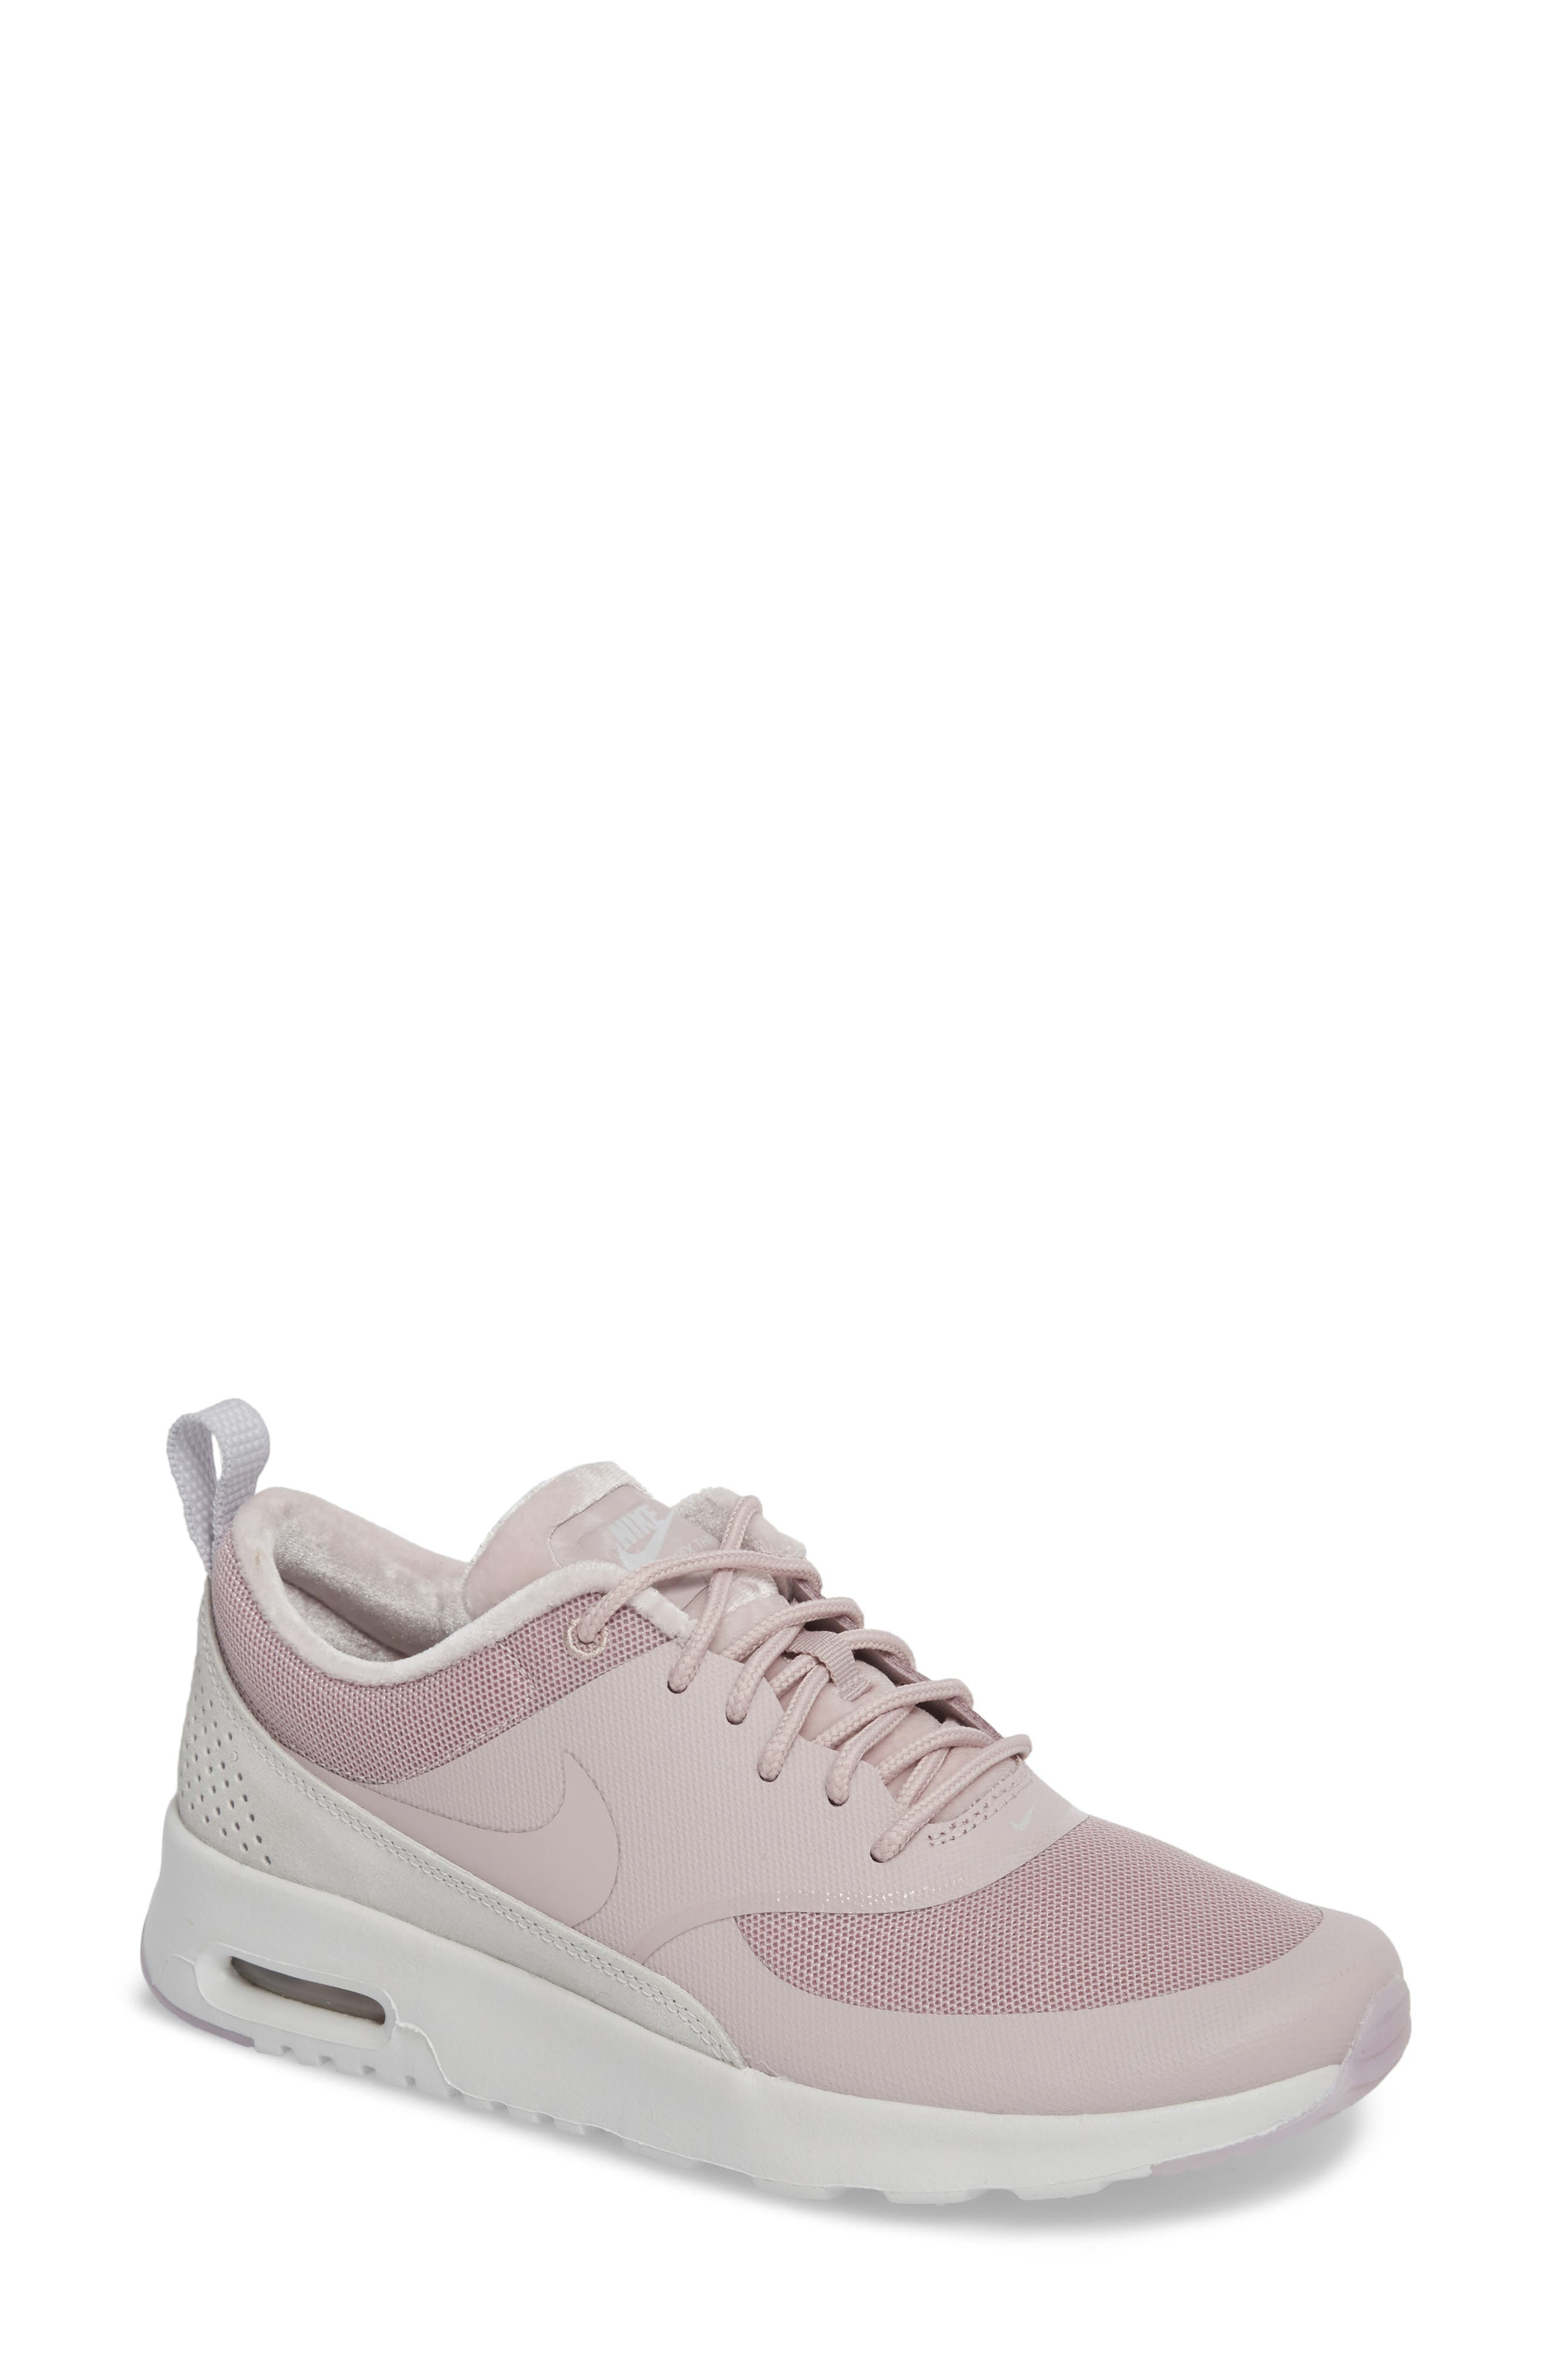 Nike Air Max Thea LX Sneaker (Women)